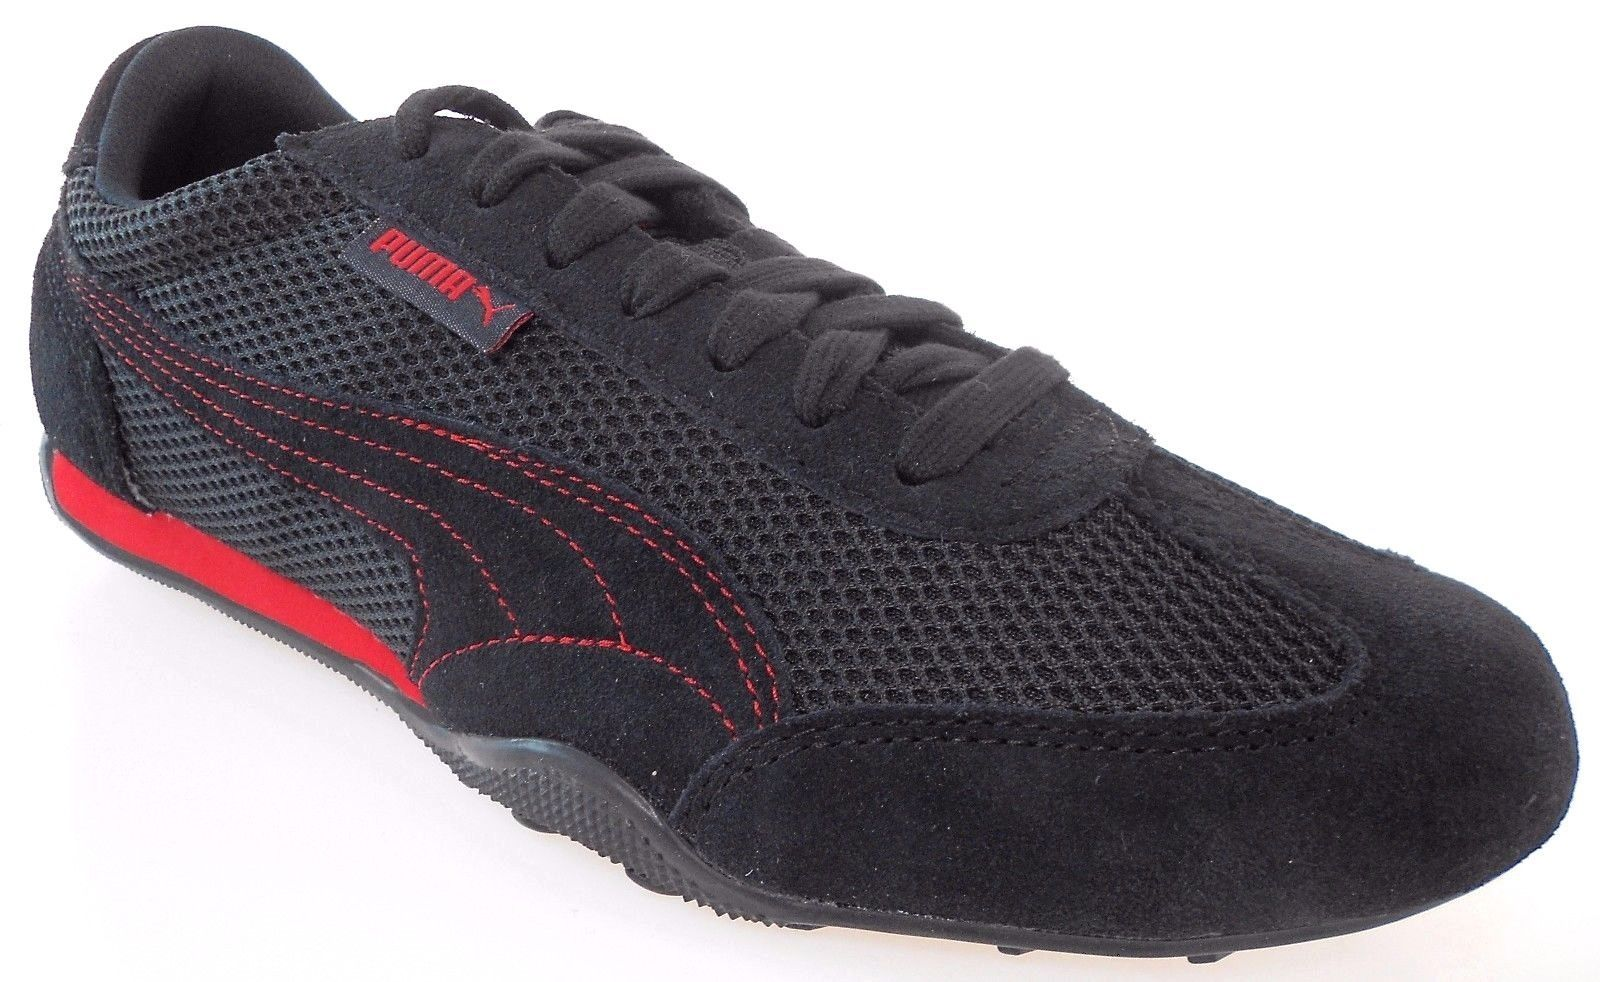 5518f5e8745001 Puma 76 Runner Mesh Men s BLACK RED Shoes and 50 similar items